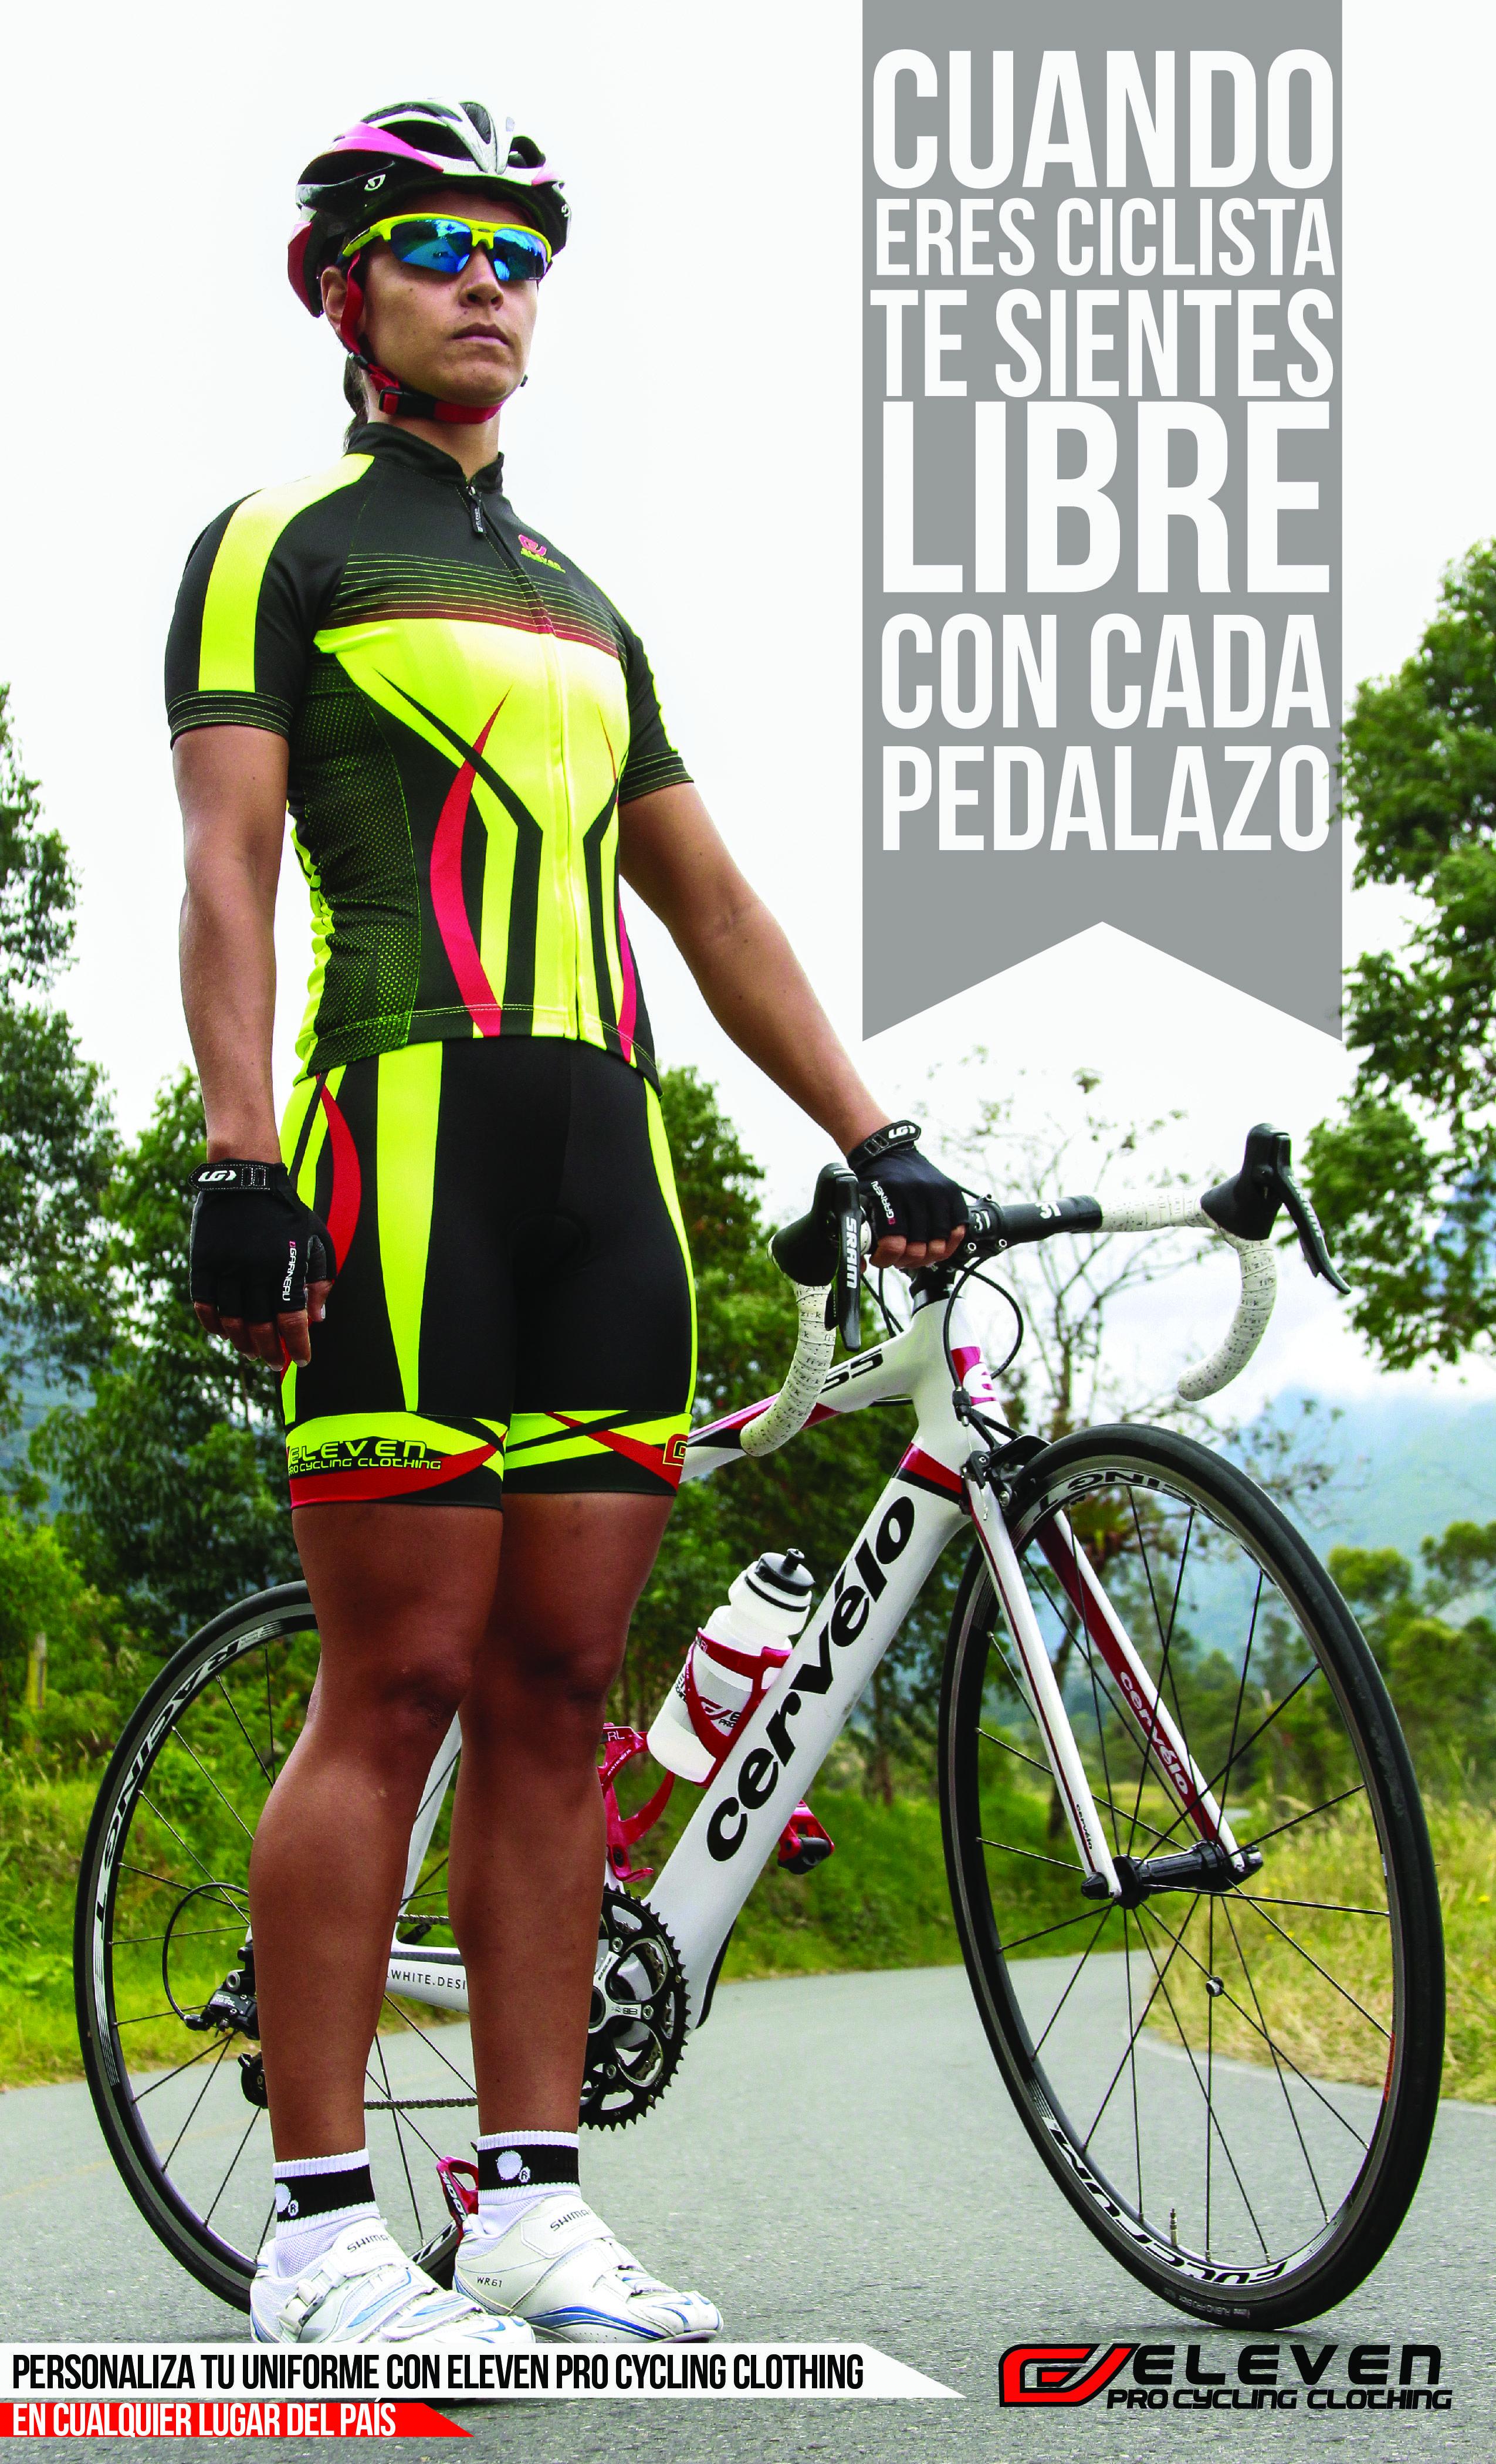 Pro Clycling Clothing Ropa De Ciclismo Marcas De Ropa Deportiva Uniformes De Ciclismo